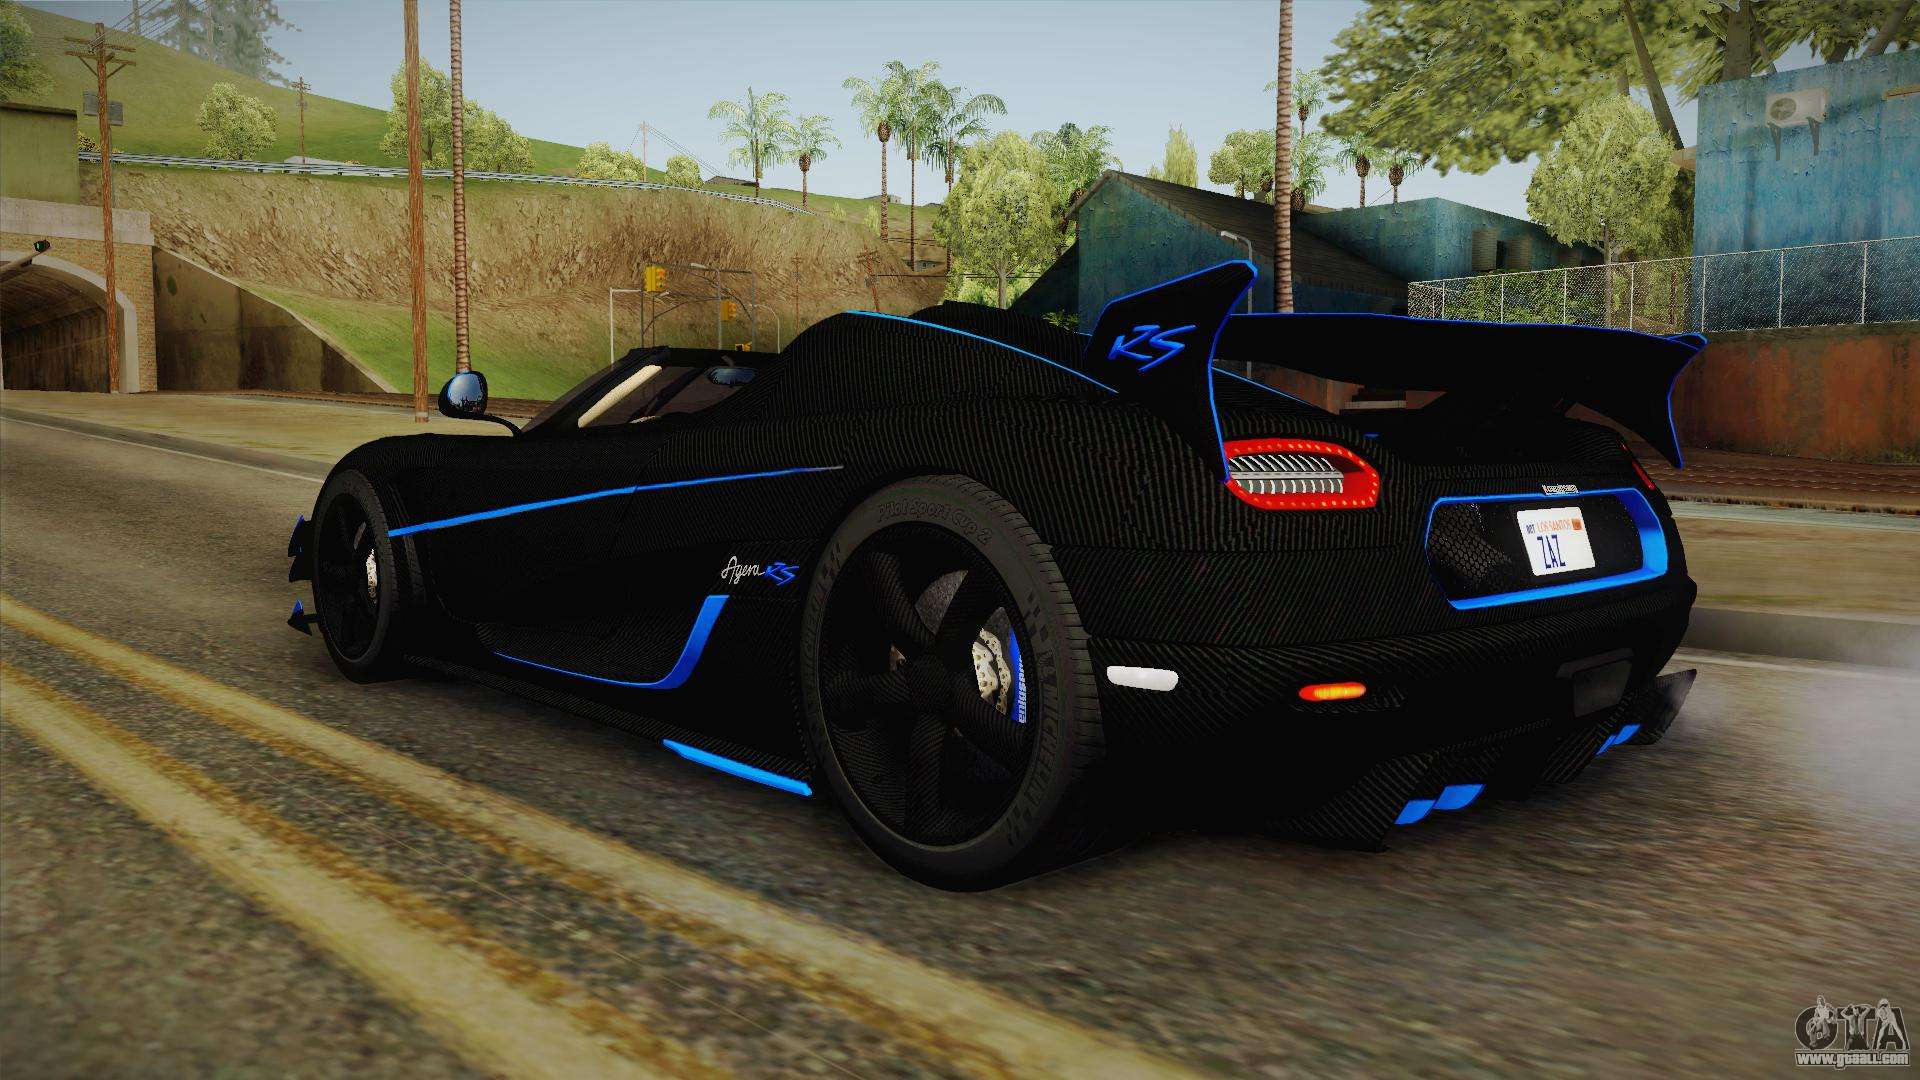 440147-gta-sa-2017-08-07-22-11-02-58 Terrific Bugatti Veyron Mod Gta Sa Cars Trend